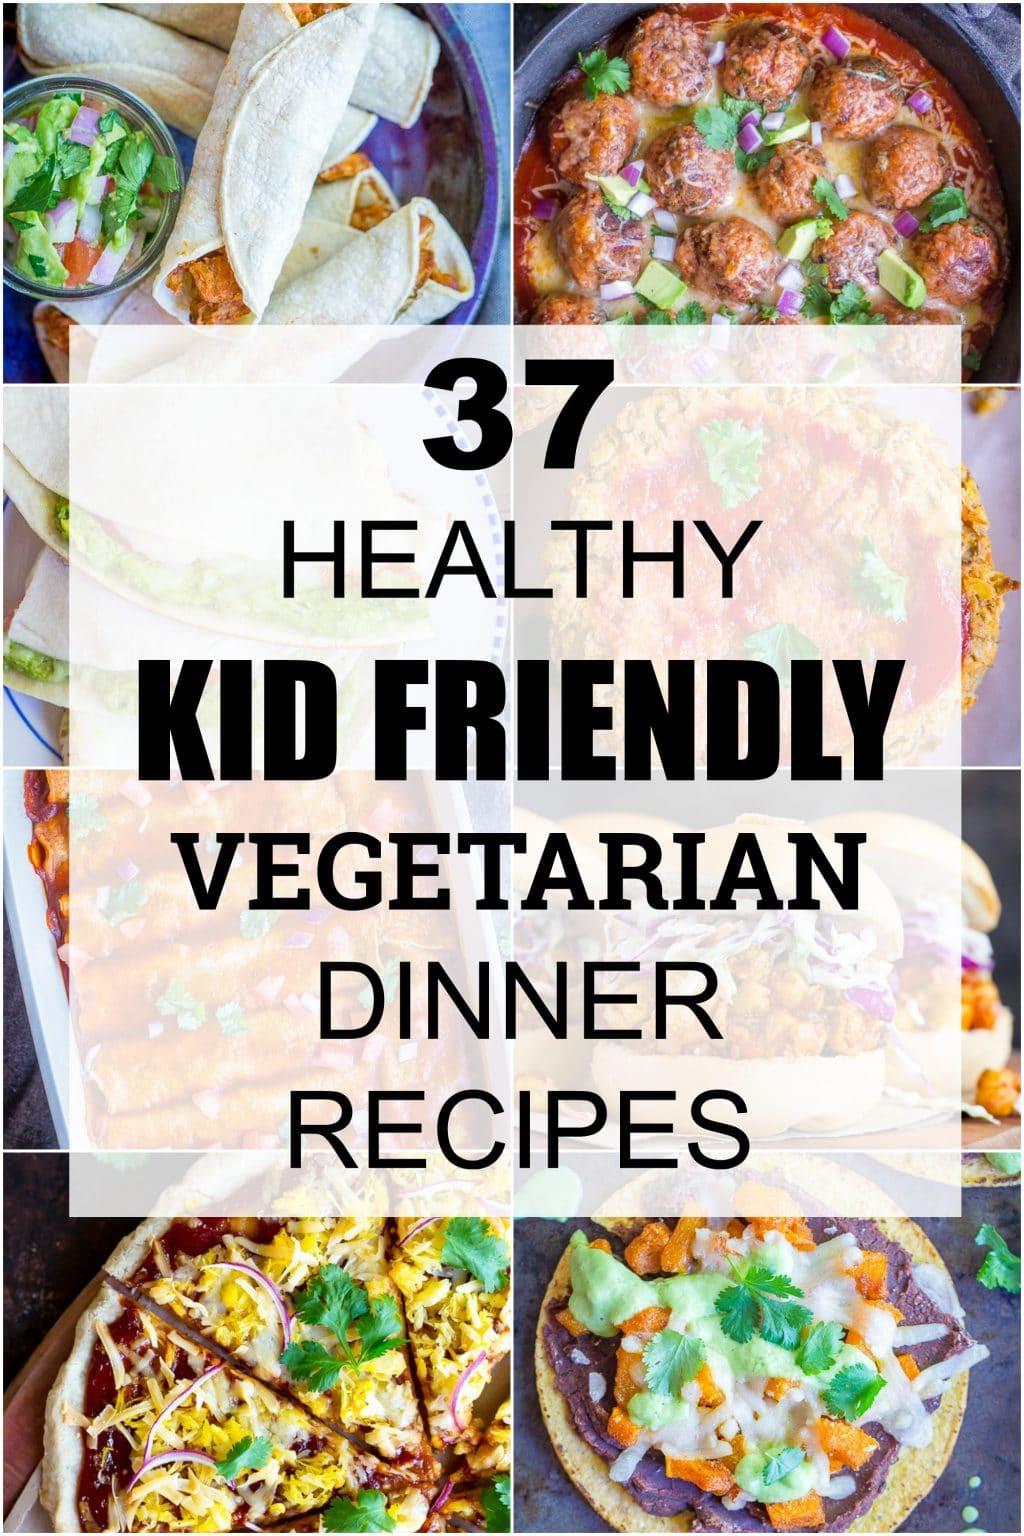 Easy Healthy Dinner Recipes Kid Friendly  37 Healthy Kid Friendly Ve arian Dinner Recipes She